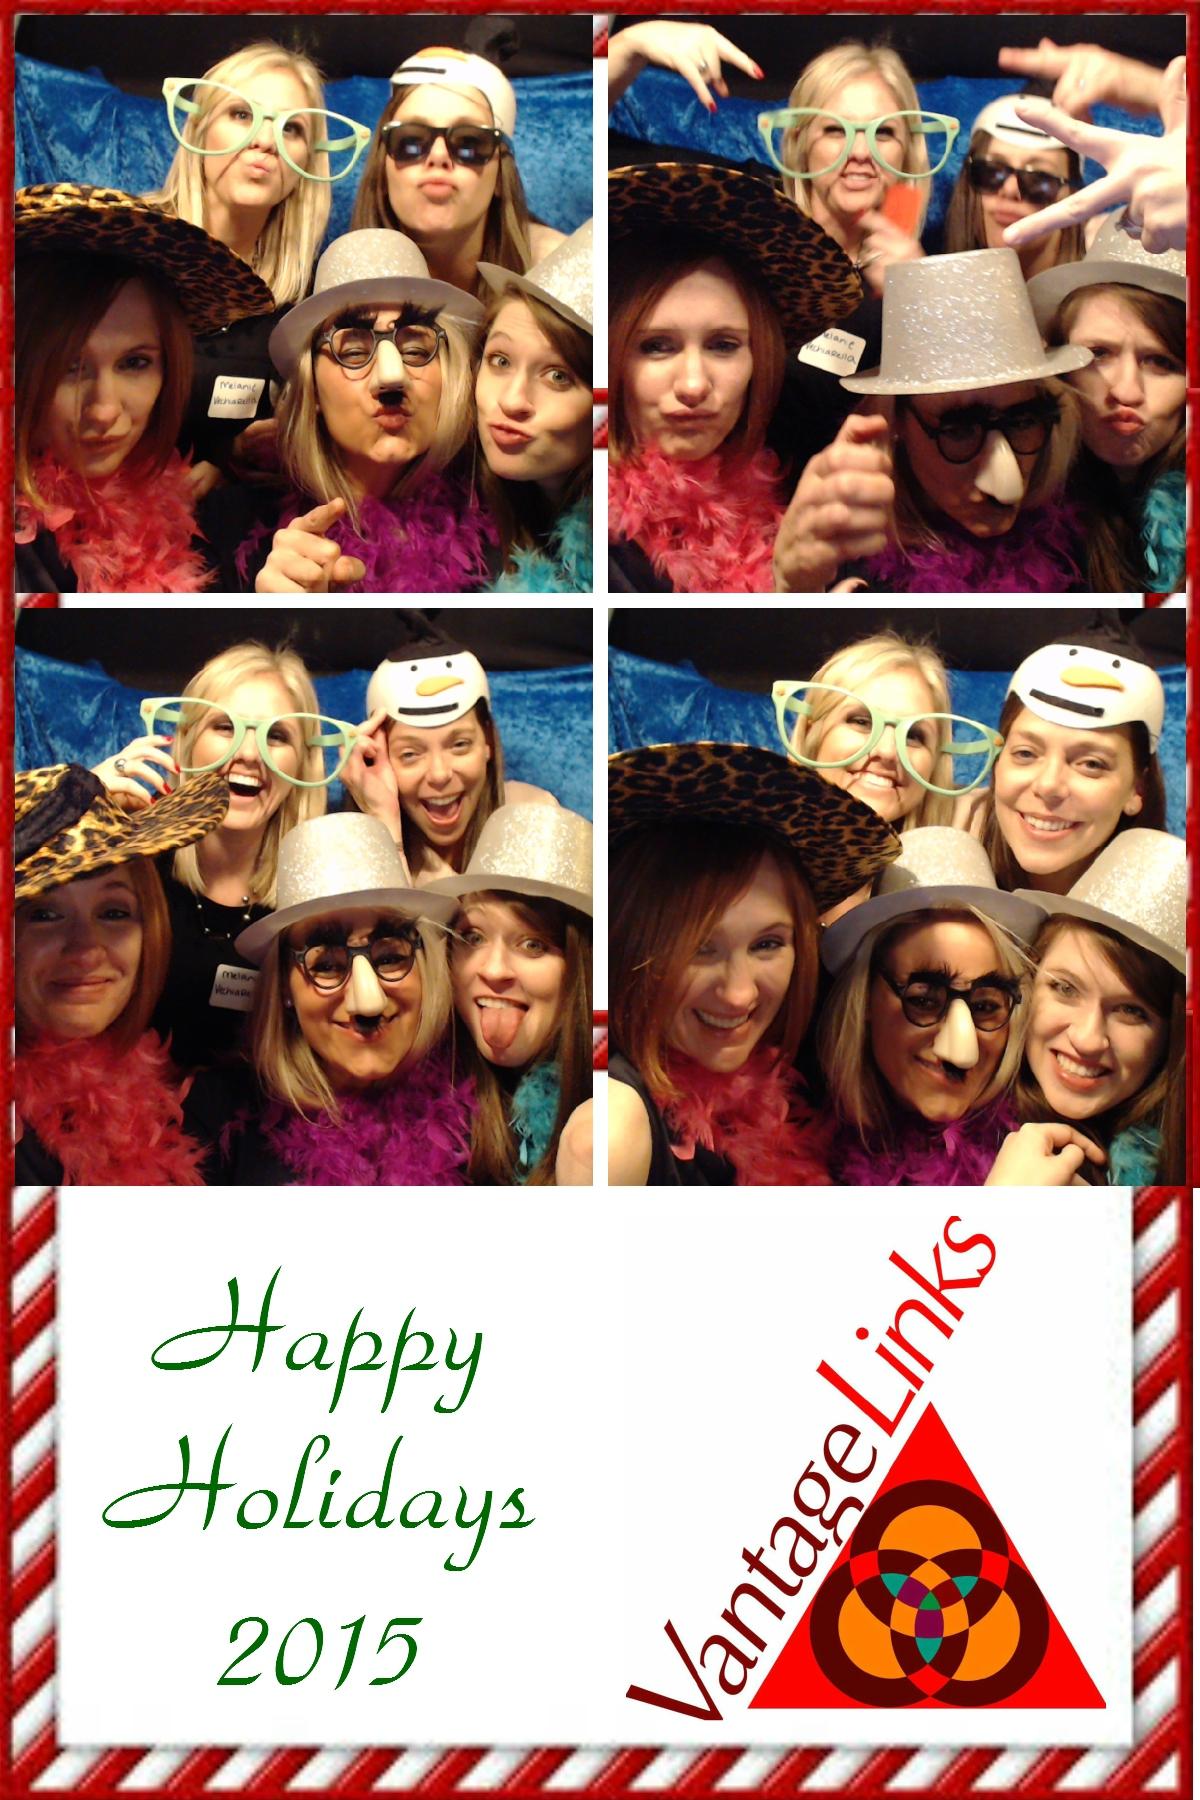 Amber, Bethany, Melanie, Shelby & Dawn